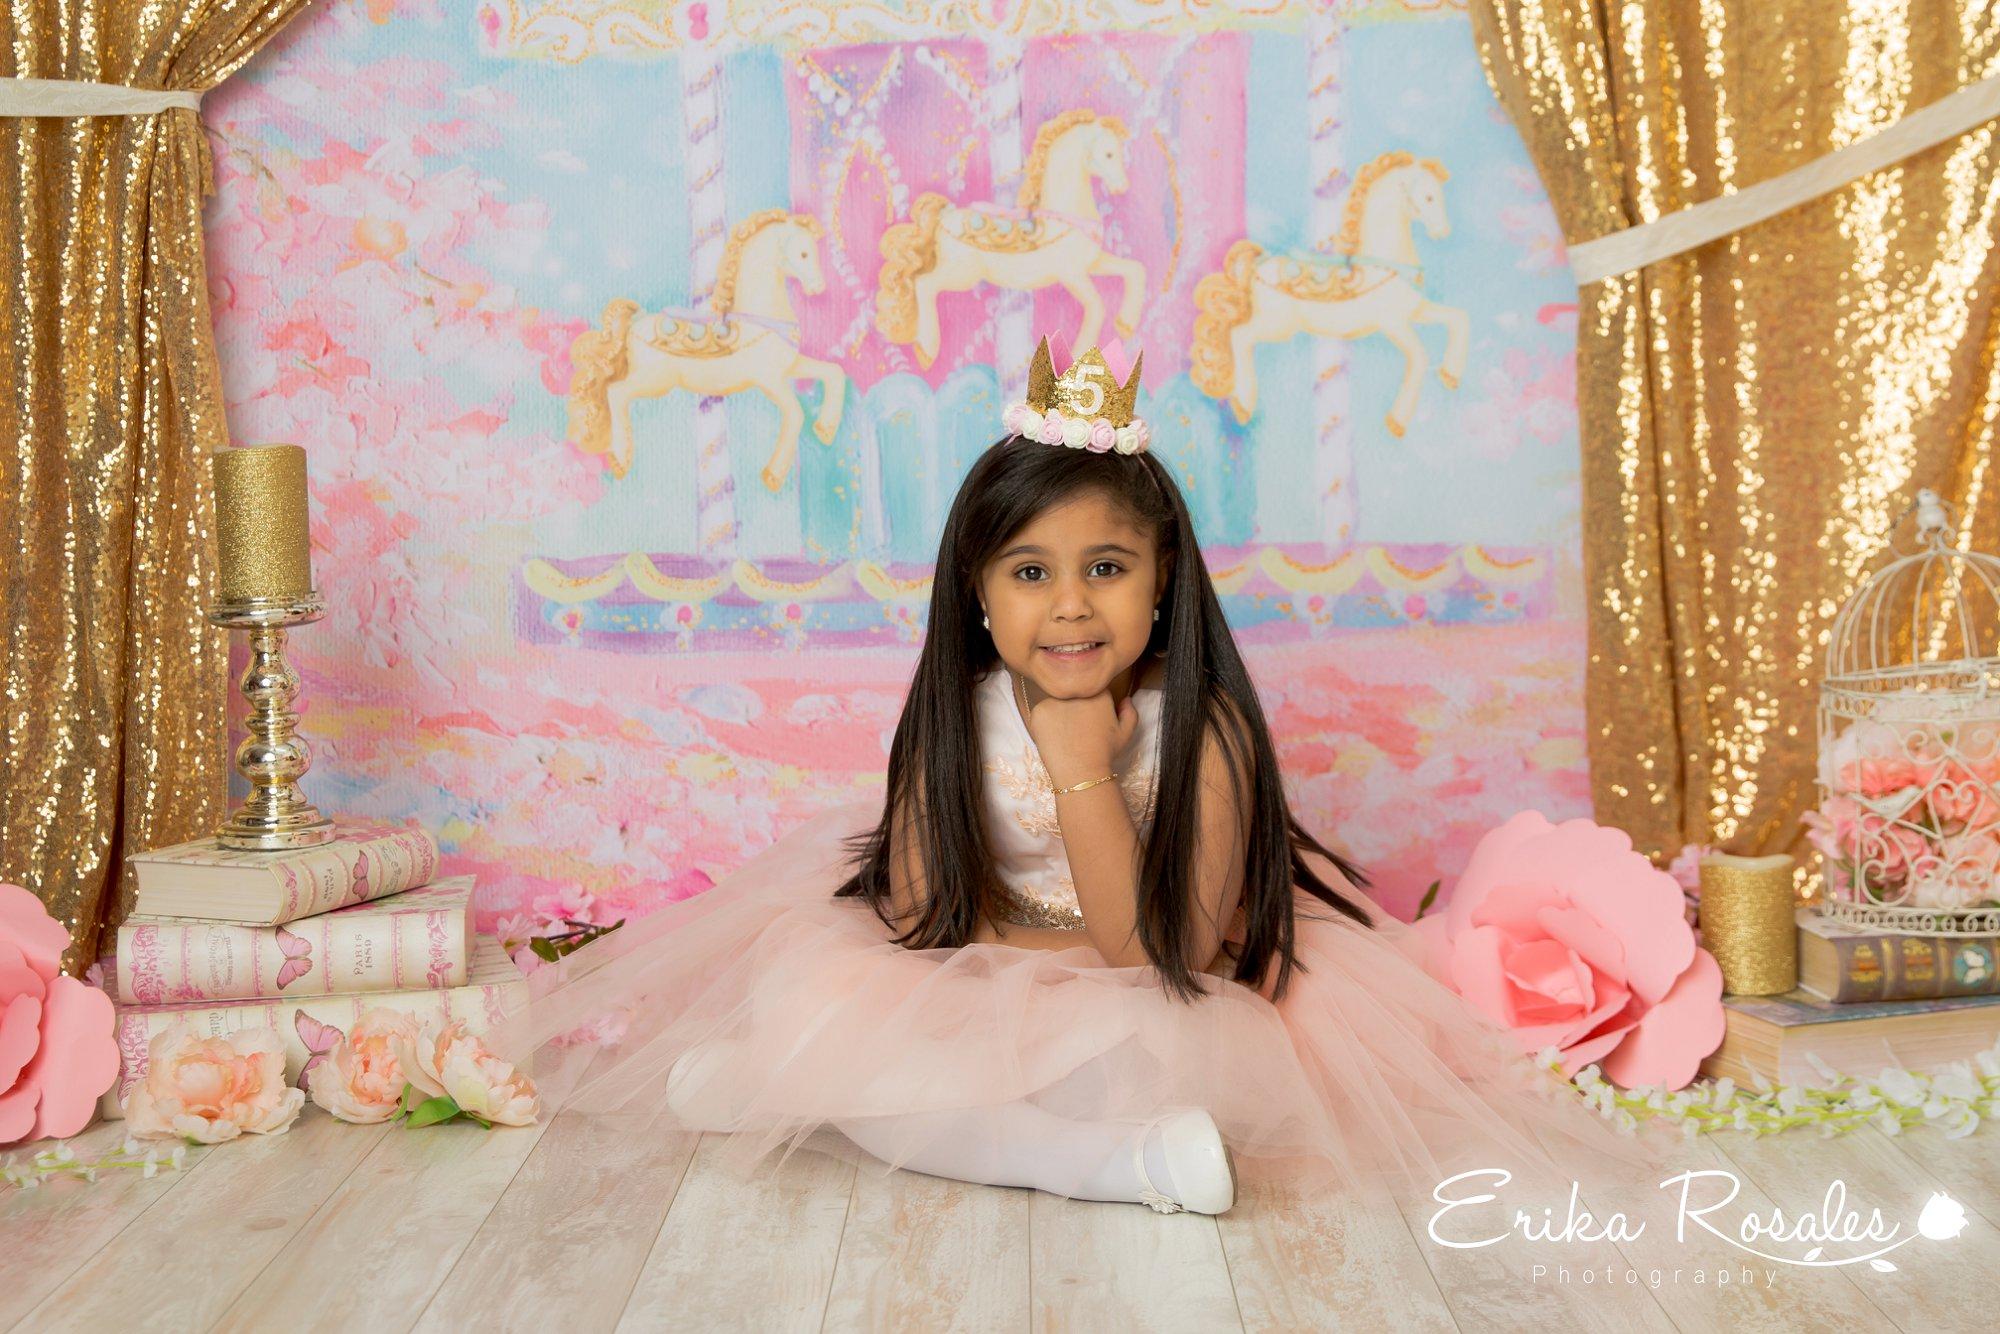 2018-02-13_0015 | Erika Rosales New York Photo Studio ...  2018-02-13_0015...